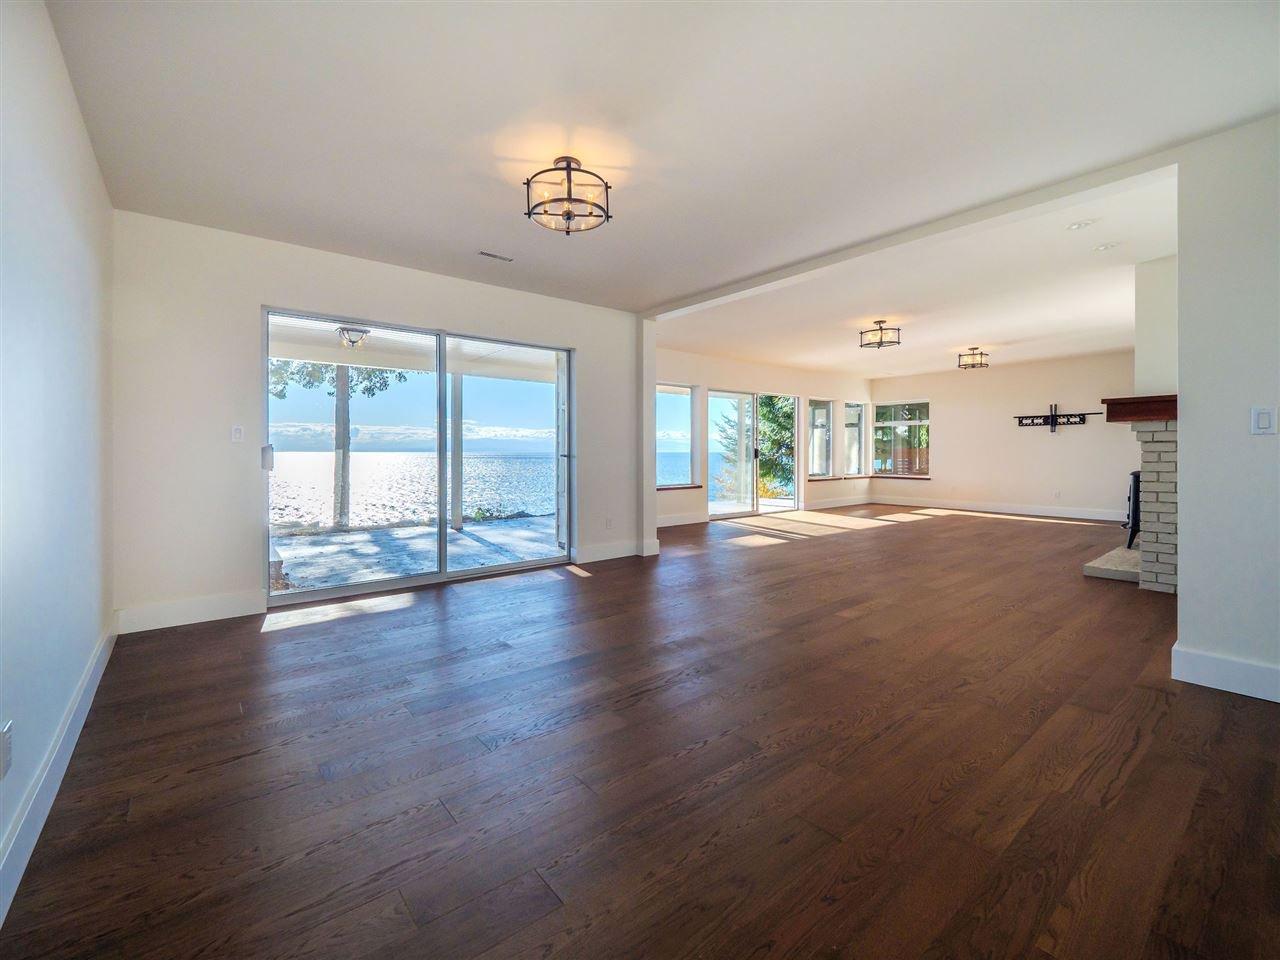 "Photo 34: Photos: 7101 DALE Road in Sechelt: Sechelt District House for sale in ""Caleda Estates"" (Sunshine Coast)  : MLS®# R2515160"